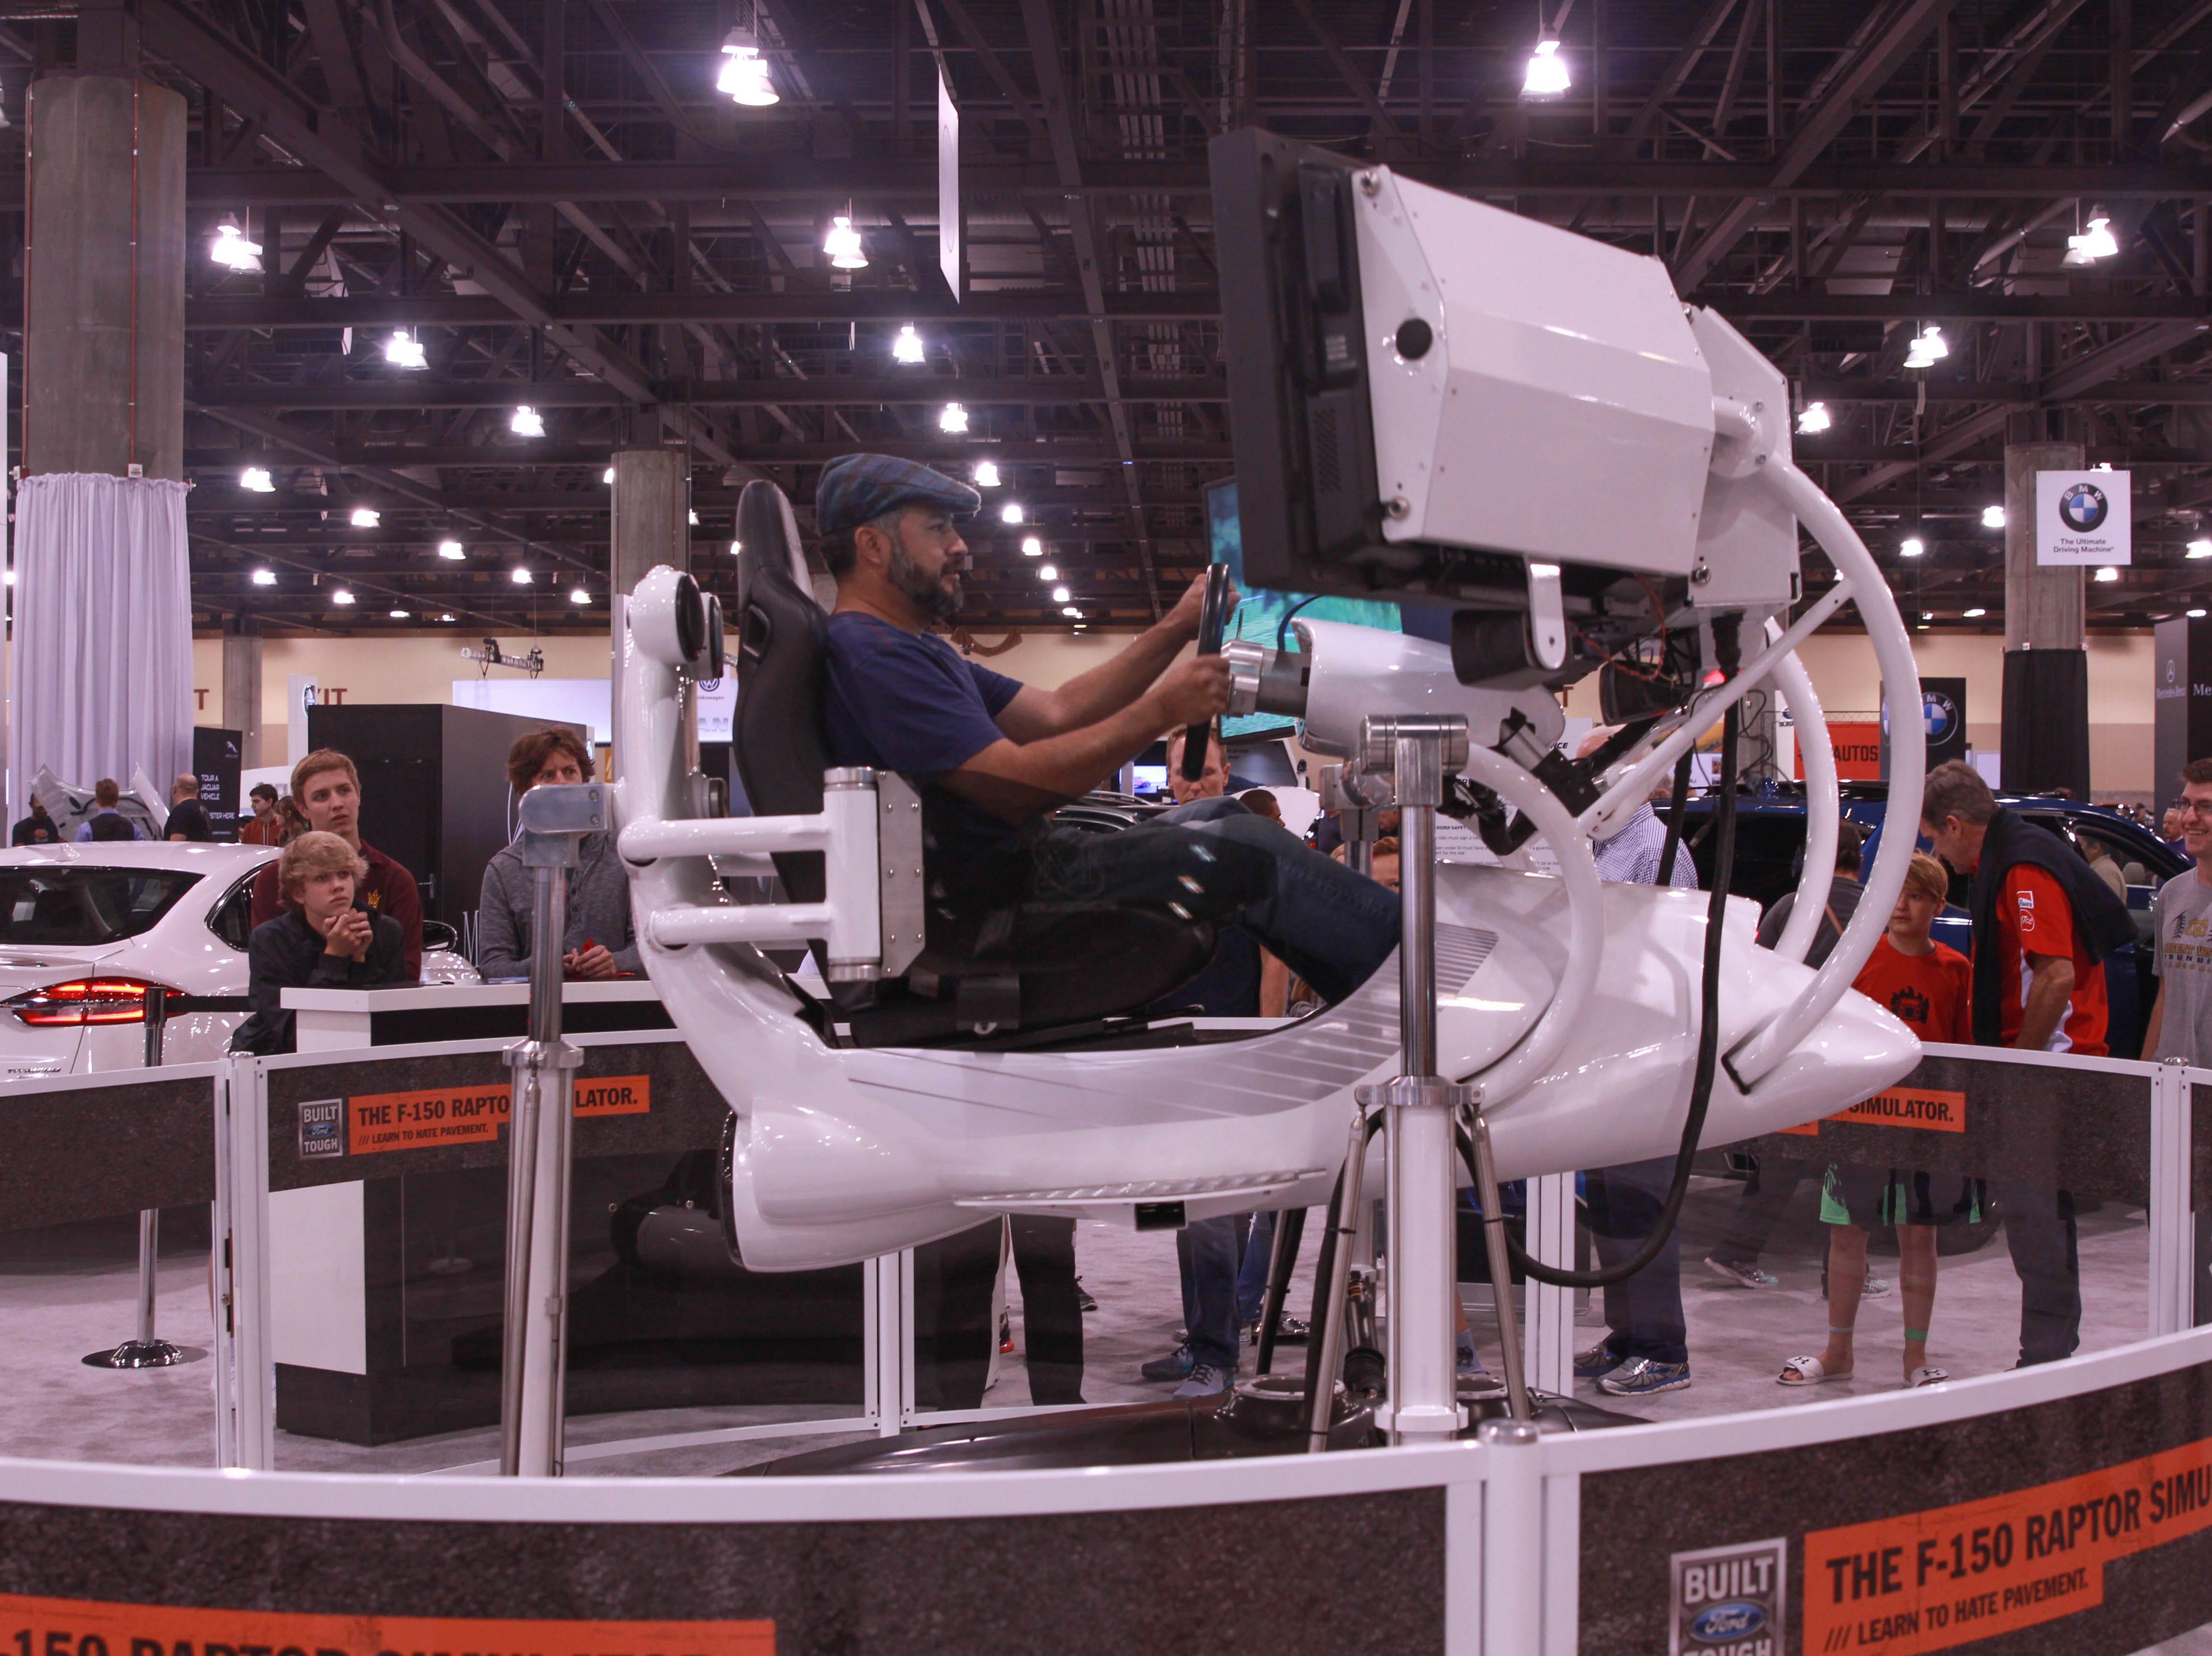 Yuri Robles tries a Ford F-150 Raptor simulator at the Arizona International Auto Show, Nov., 23, 2018.